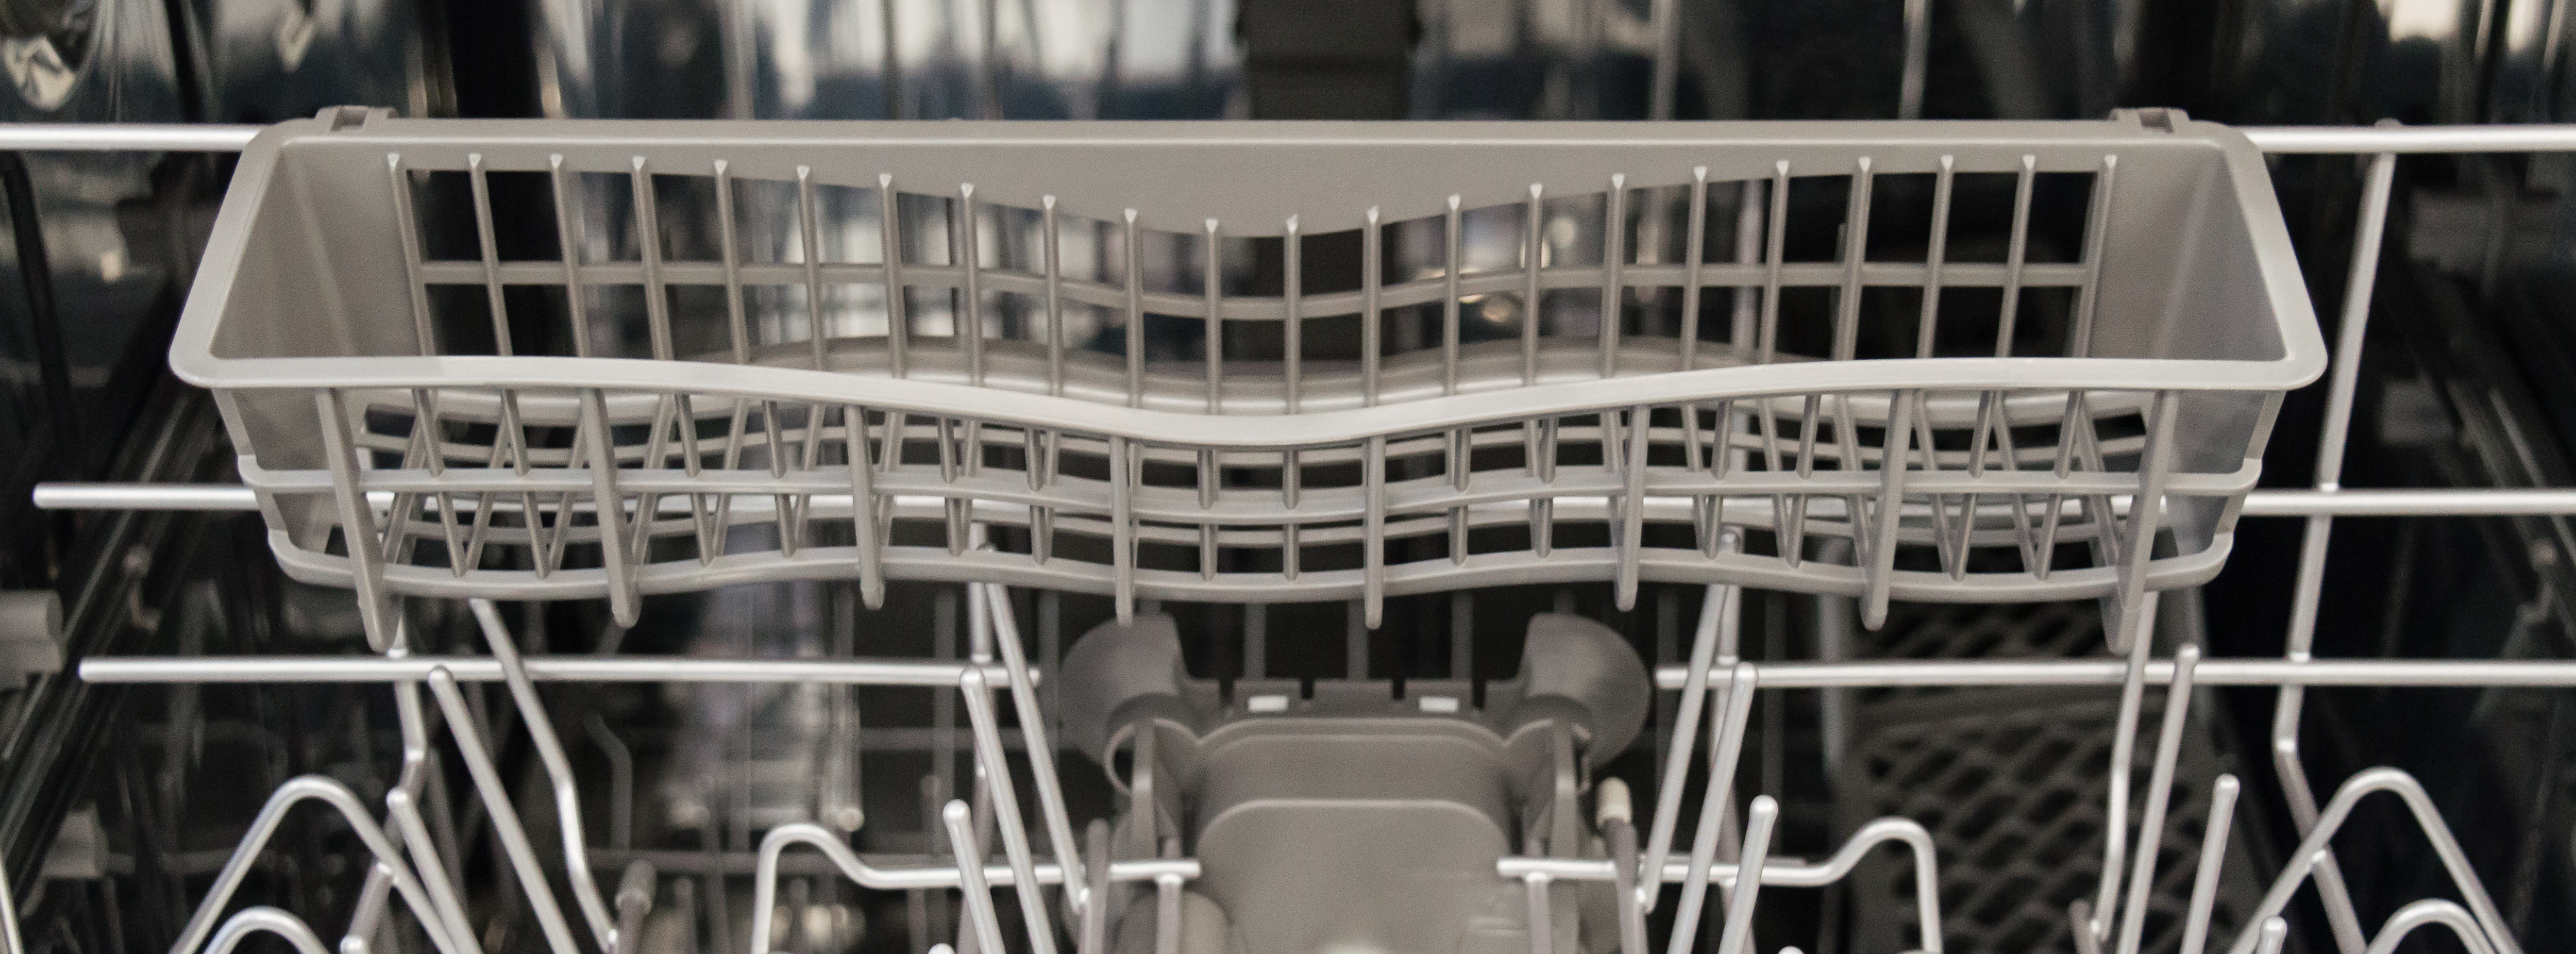 KitchenAid KDTM404ESS mini basket